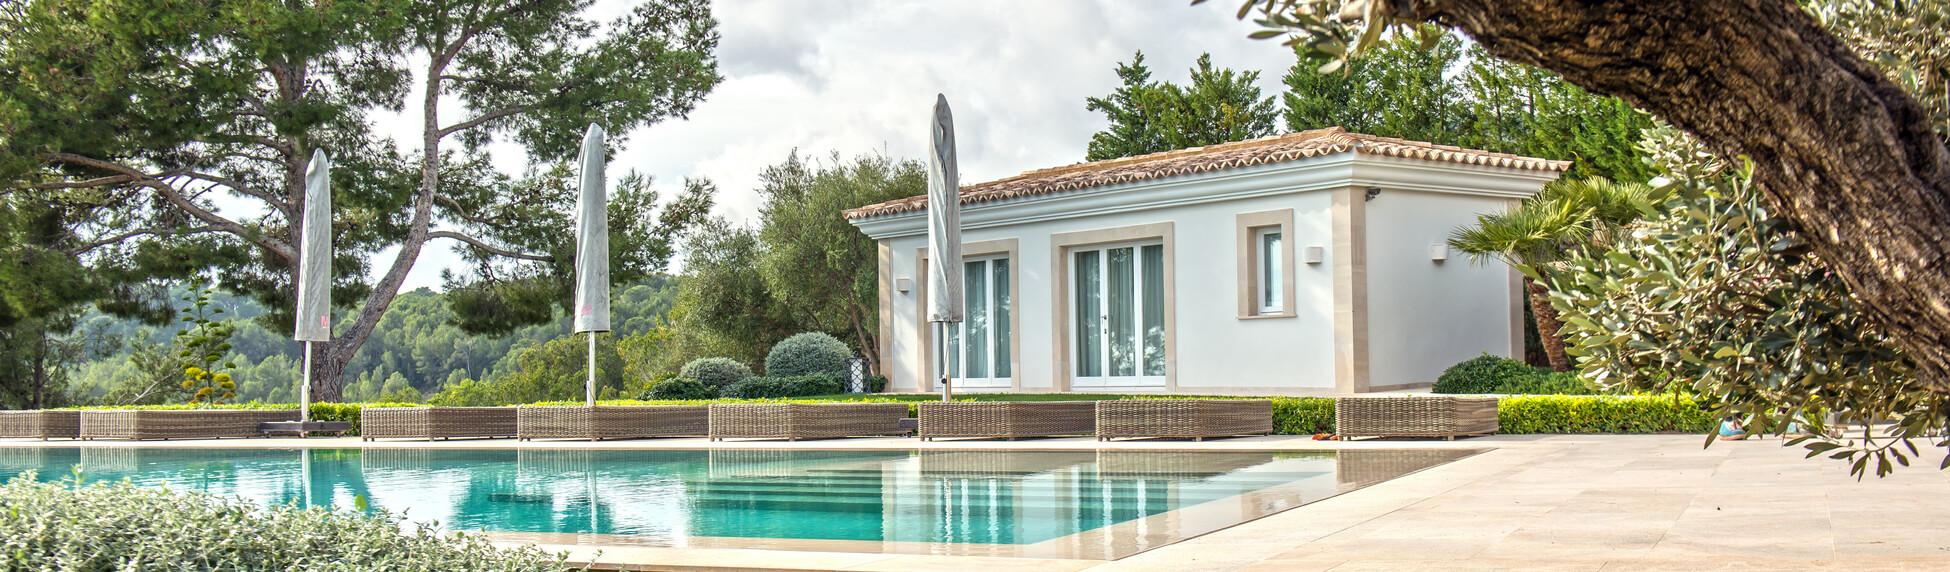 Moderne Gärten Mallorca Eden